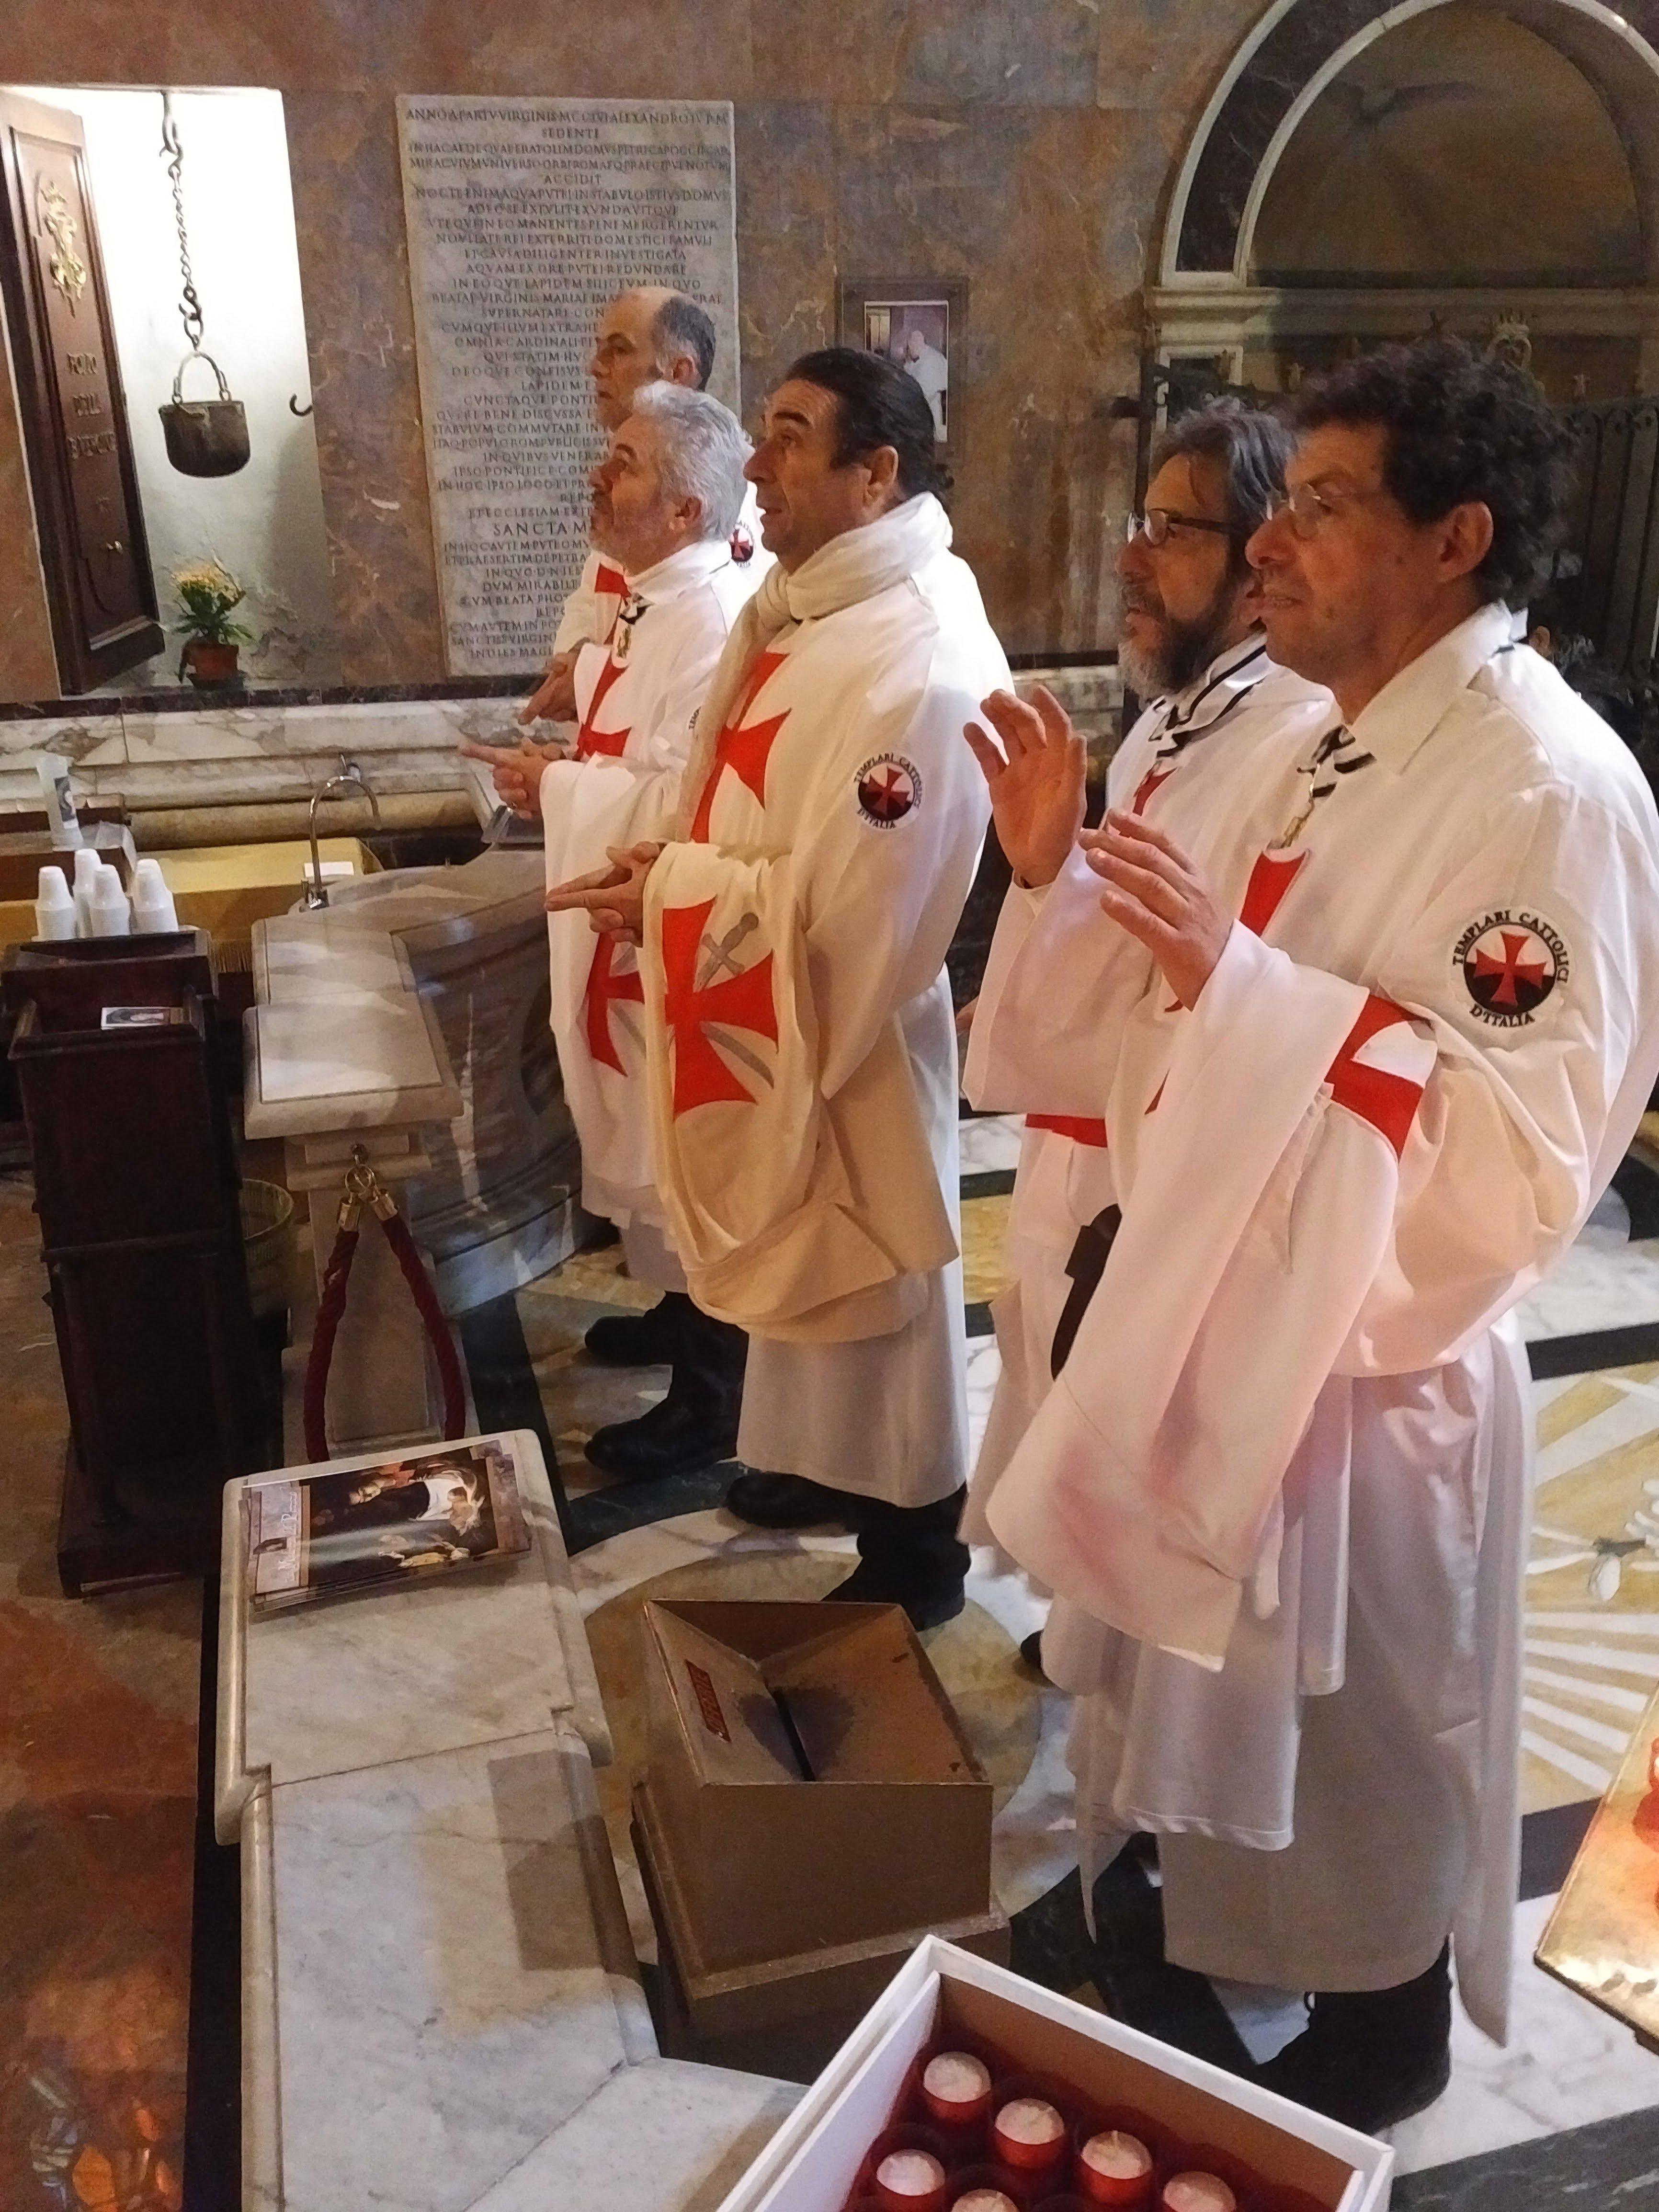 Roma 3-4 mar 2018 - Templari Cattolici foto09